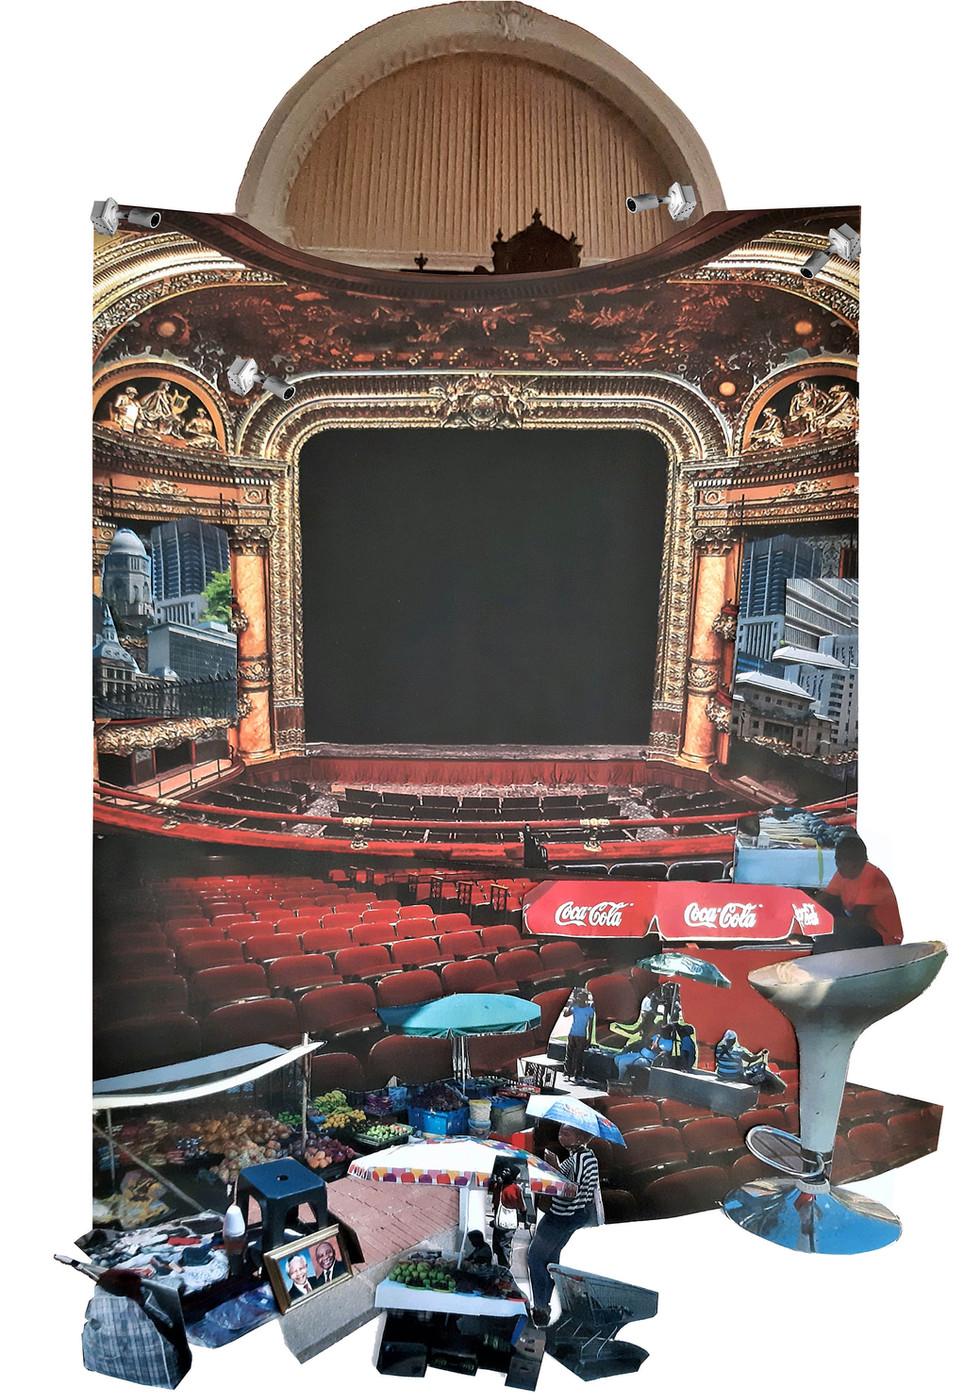 Theatres Under Surveillance. Boshoff, L. Unit 19. 2020.